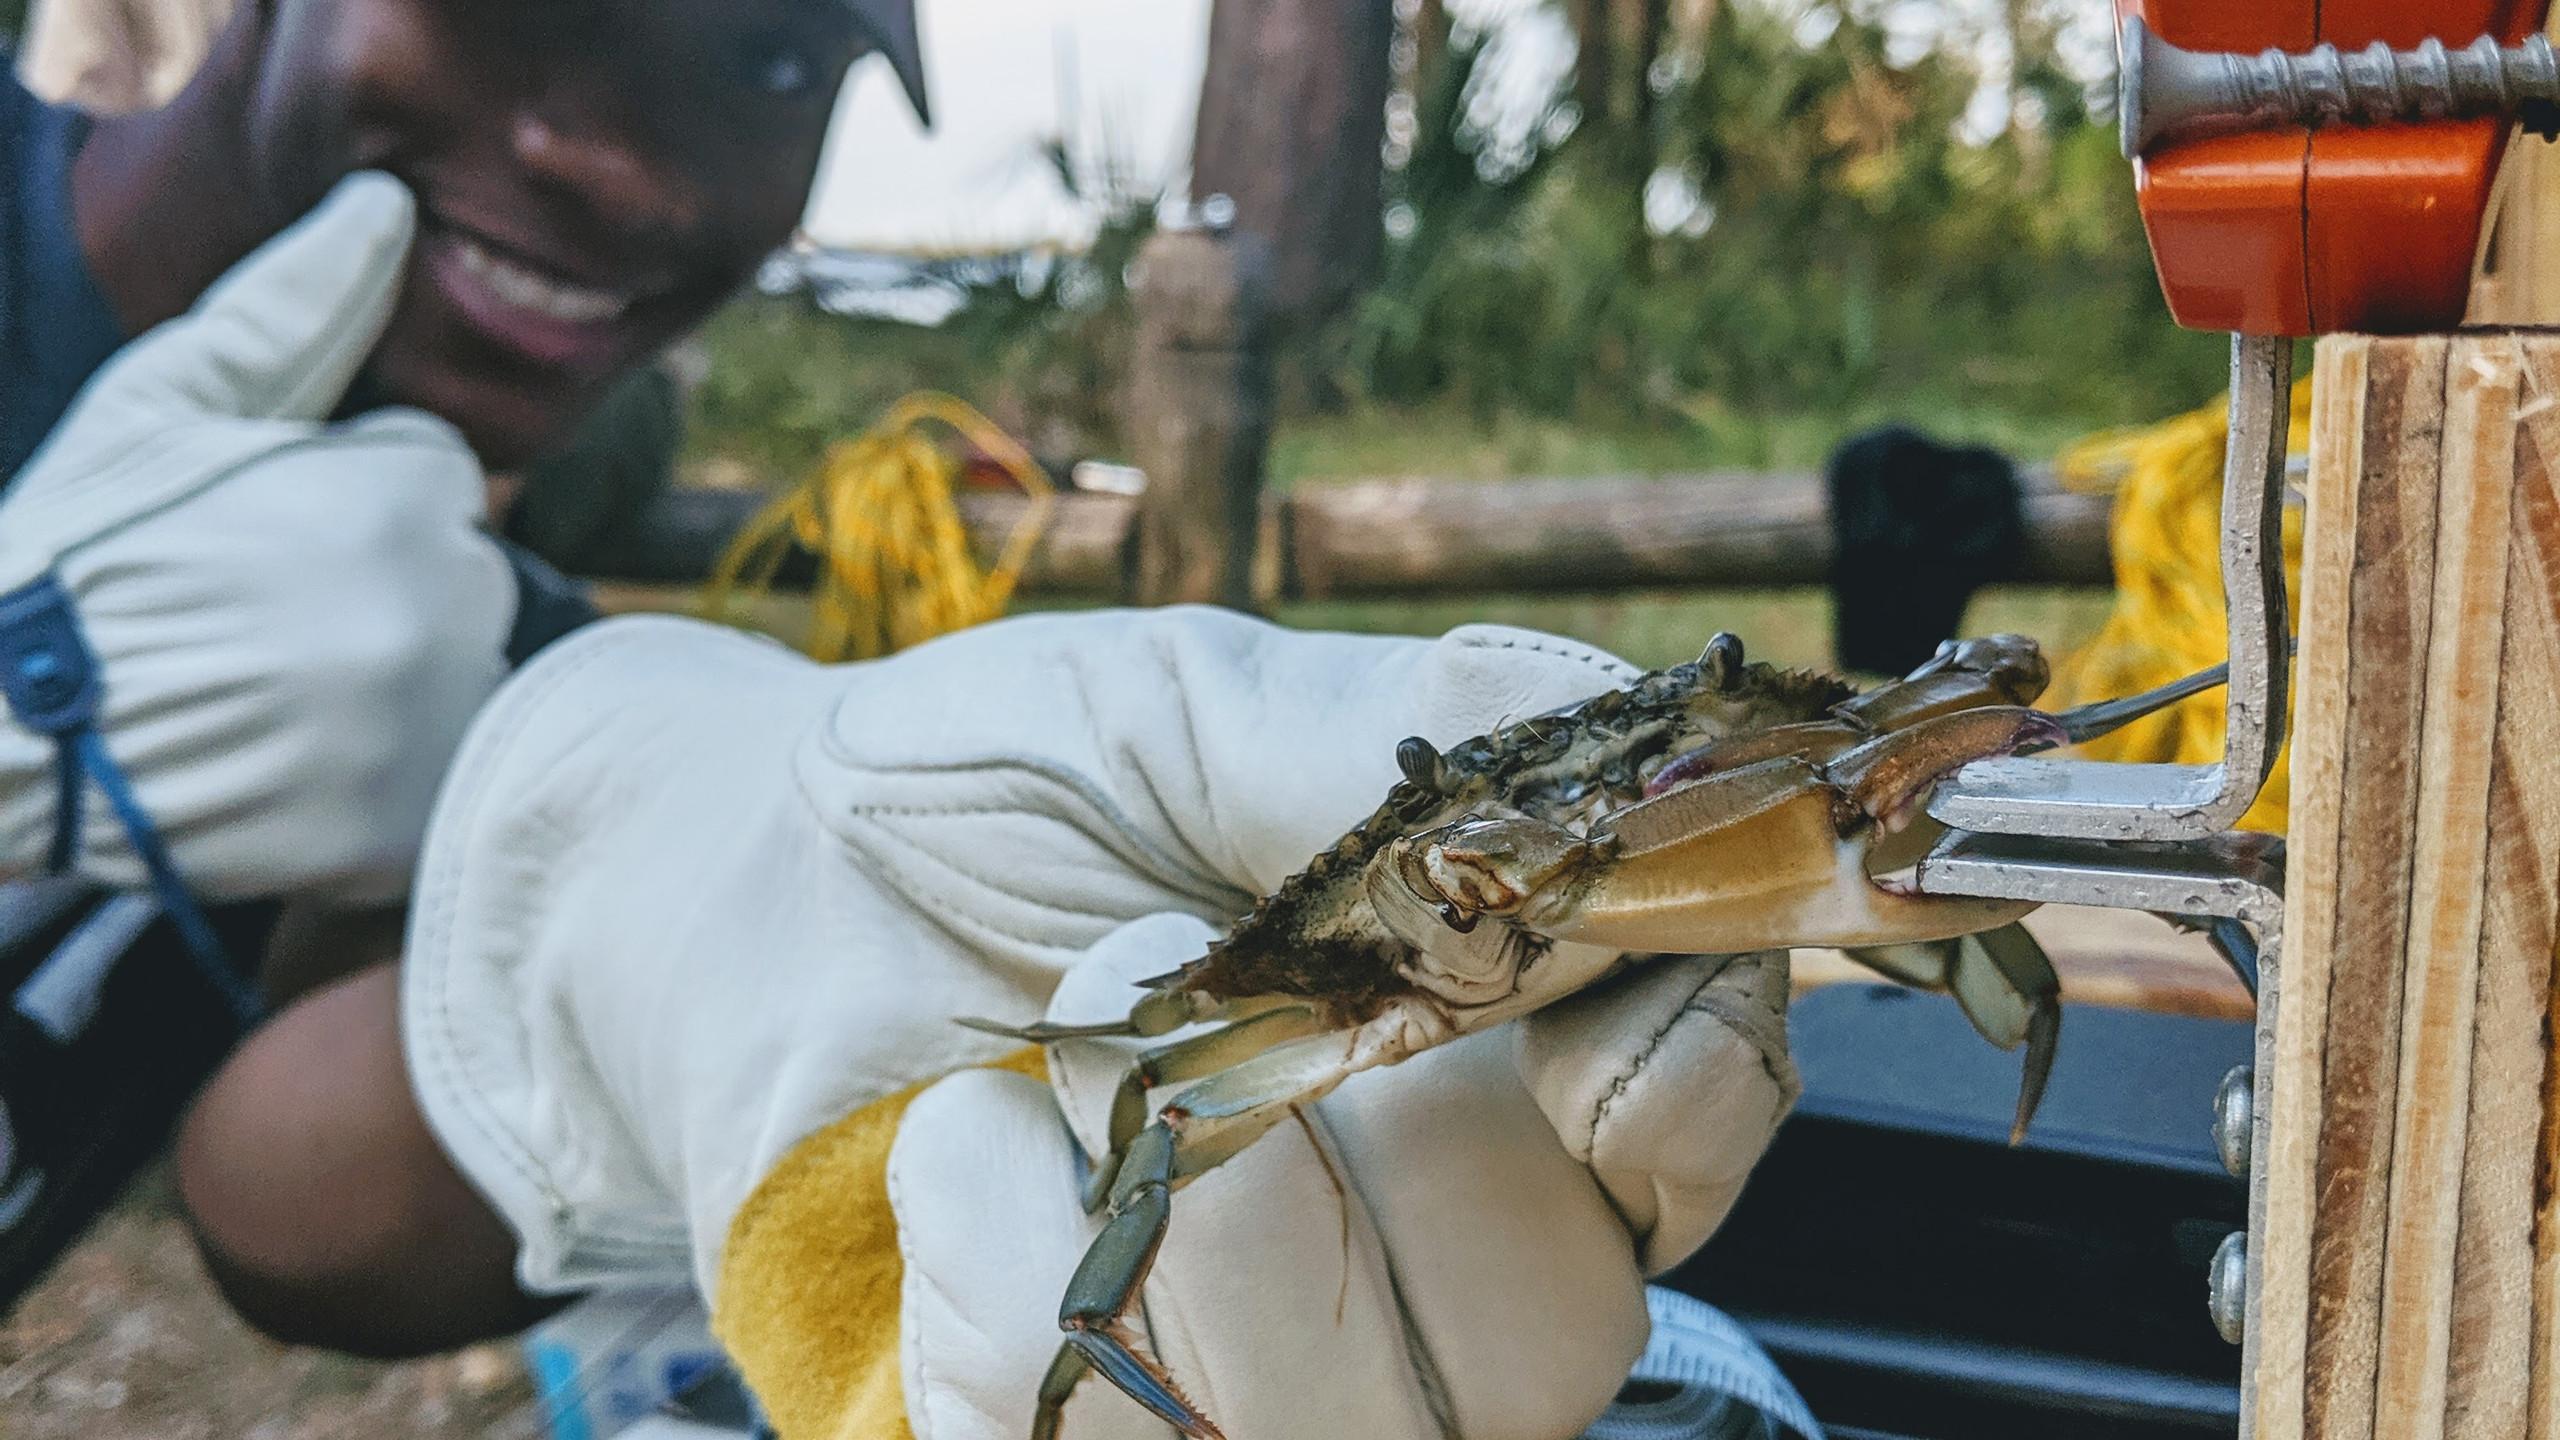 Crab pinch force